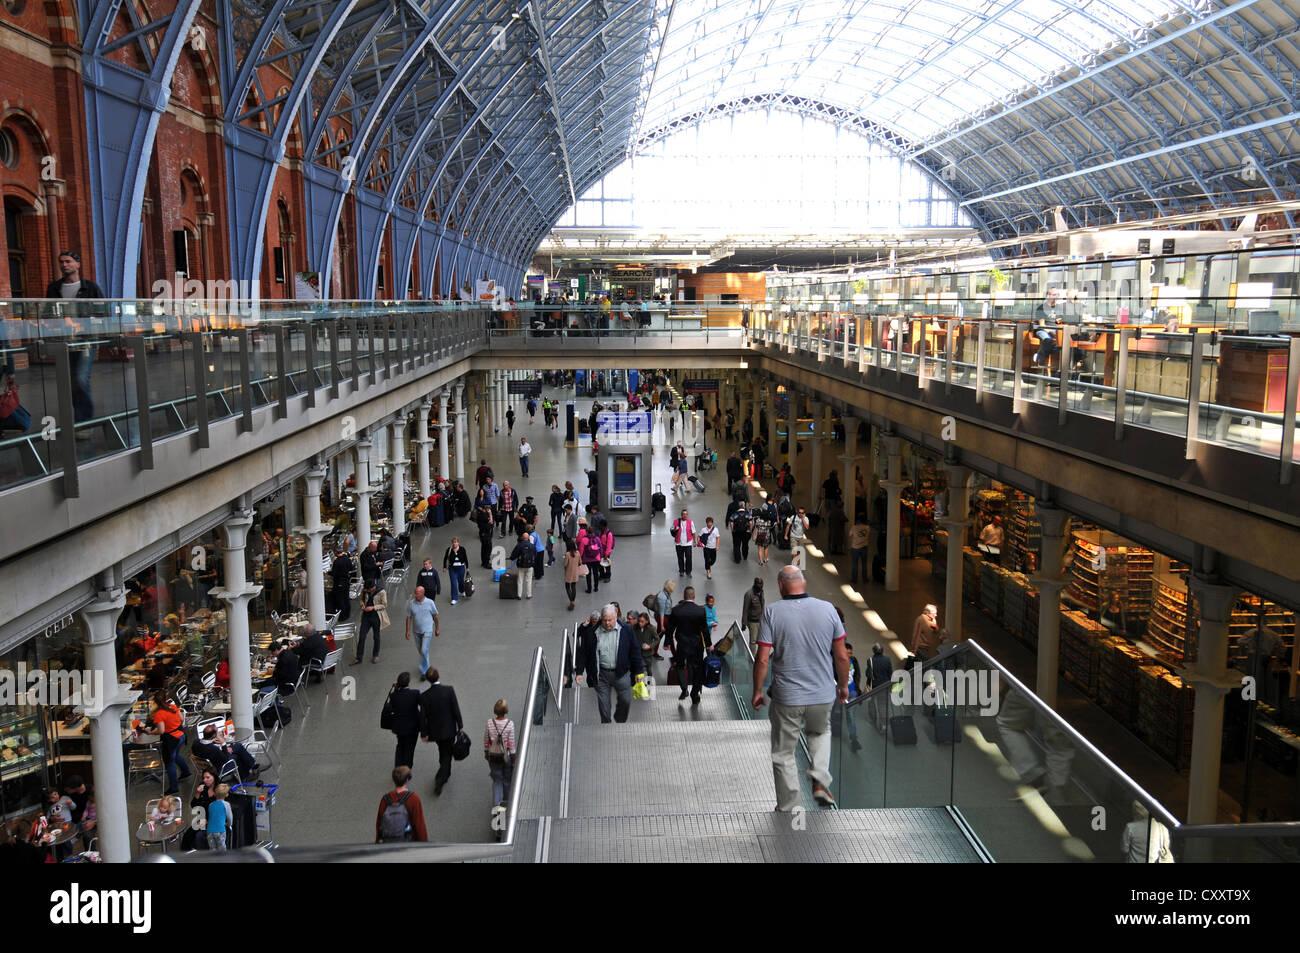 St. Pancras Railway Station, London, England, Britain, UK - Stock Image